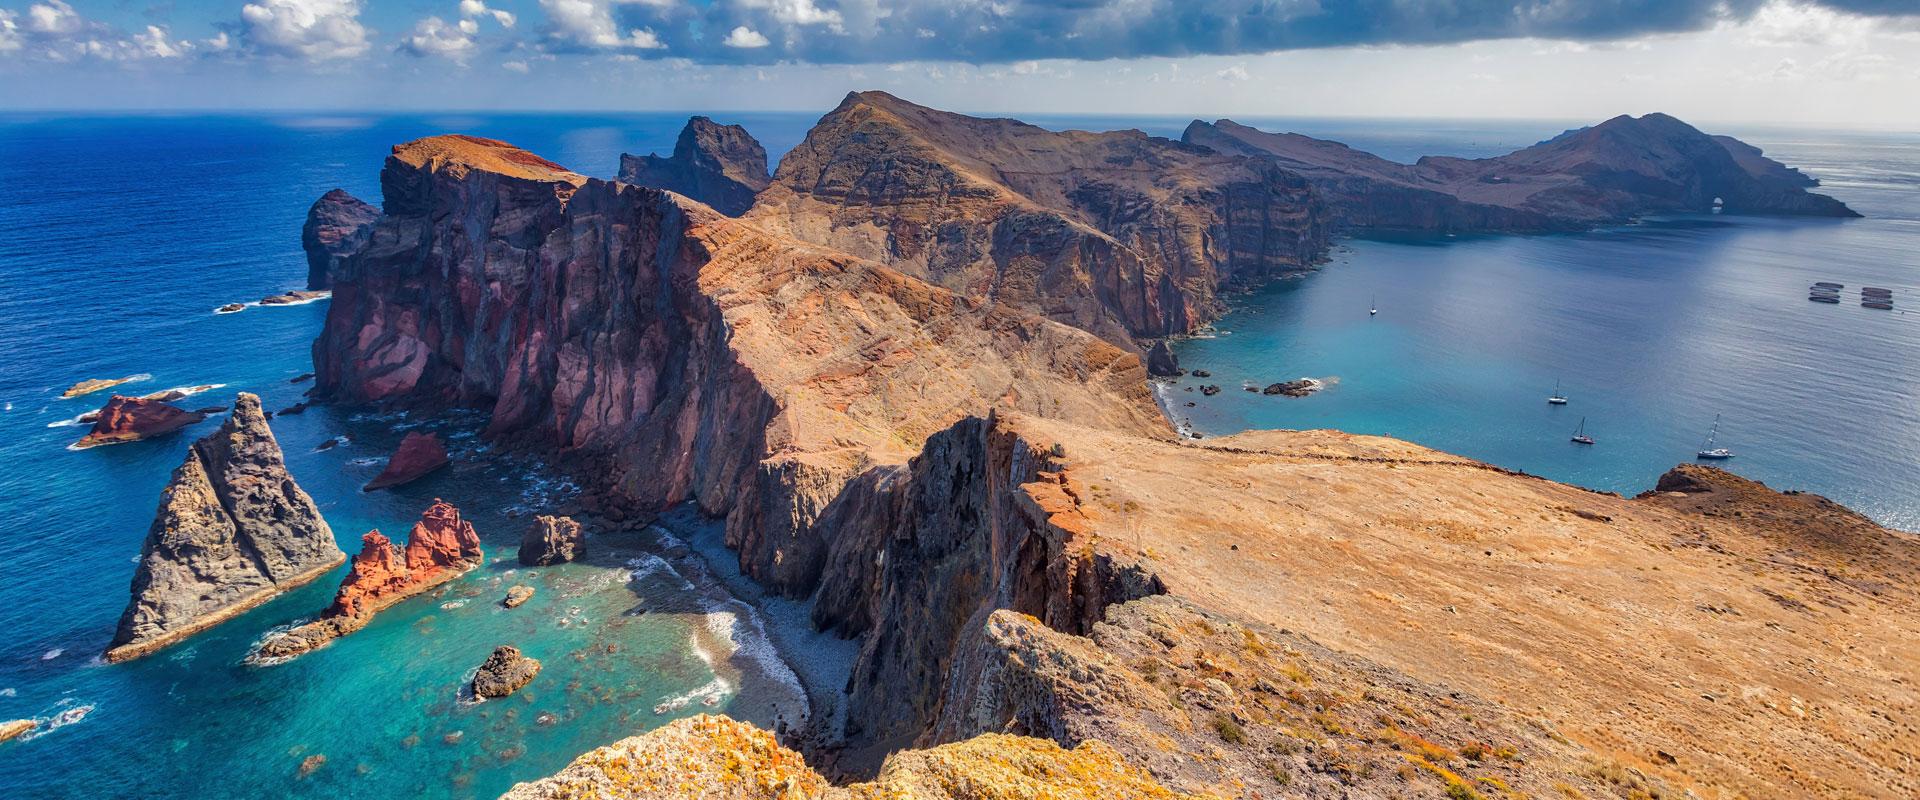 Vintervandring på Madeira